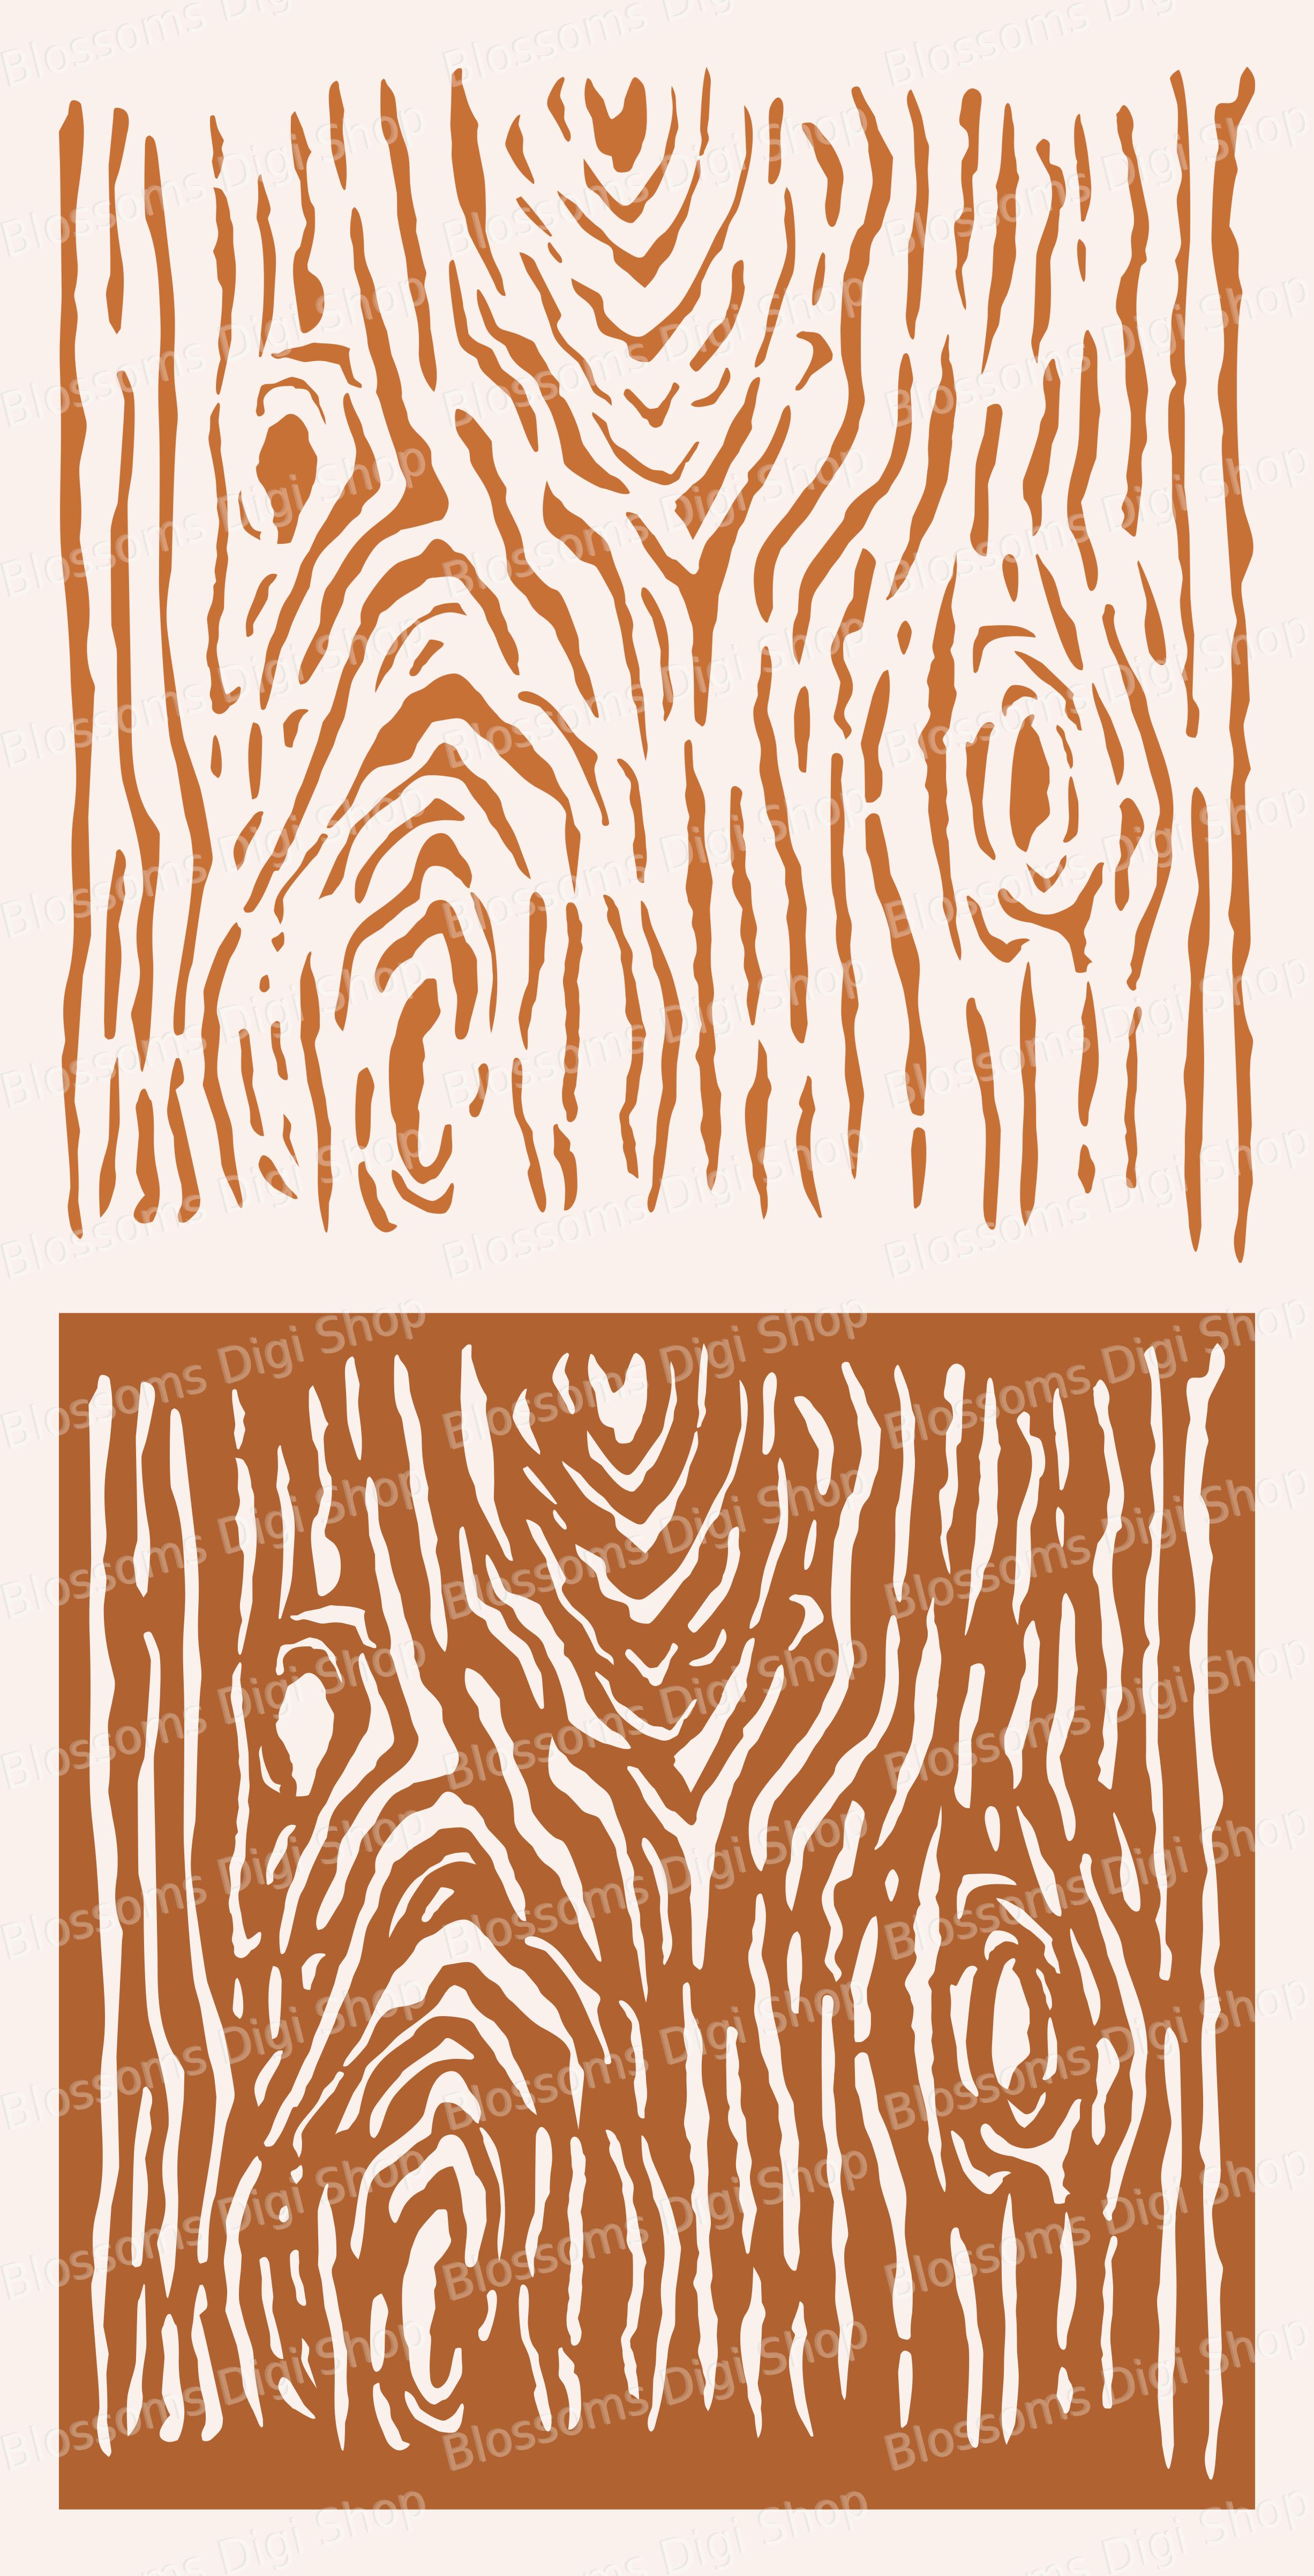 hight resolution of wood patterns stencil patterns tree stencil stencils tree templates tree bark